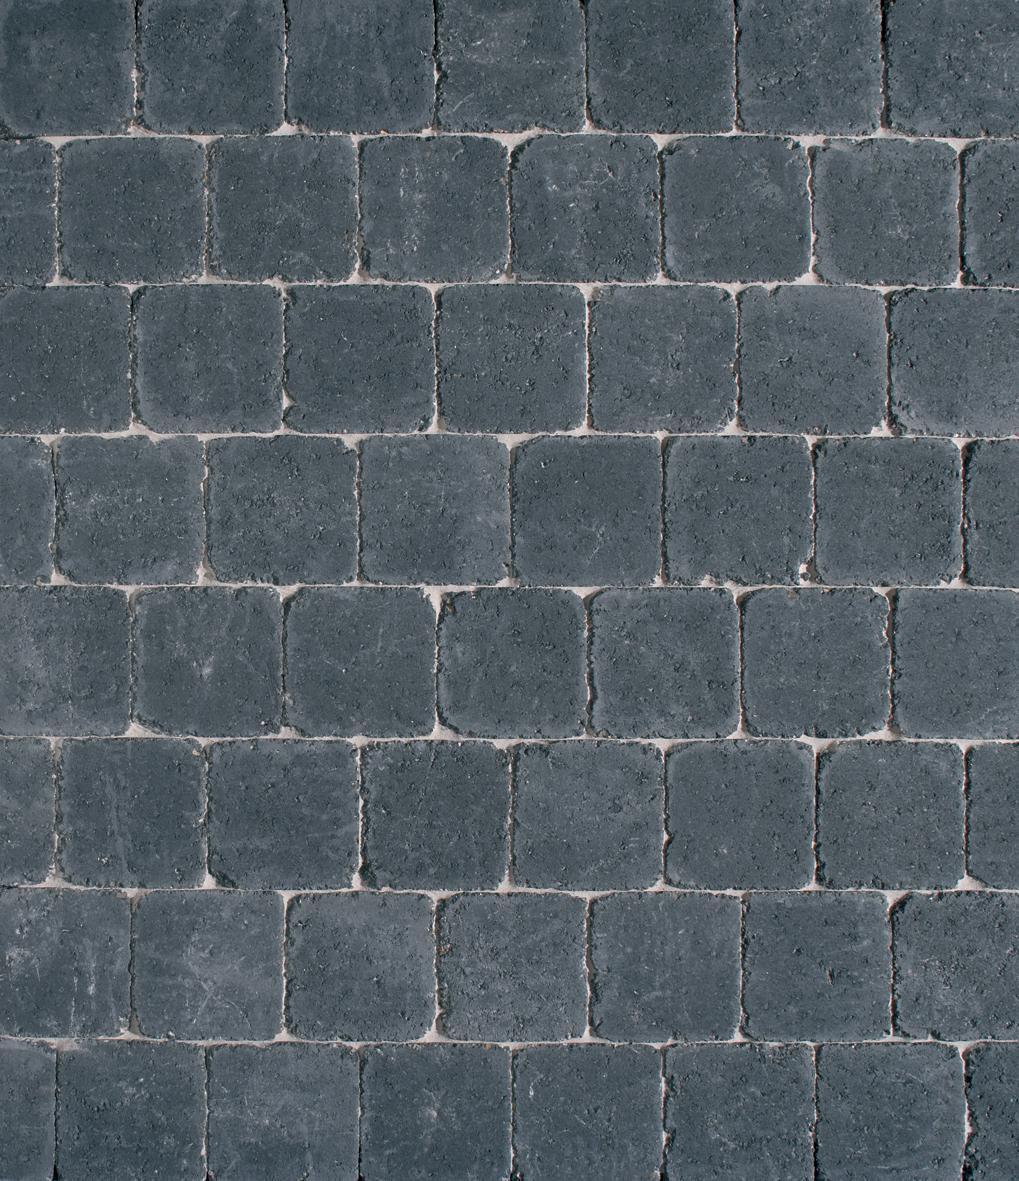 marlux alkern pav newhedge vieilli coal marlux pack. Black Bedroom Furniture Sets. Home Design Ideas